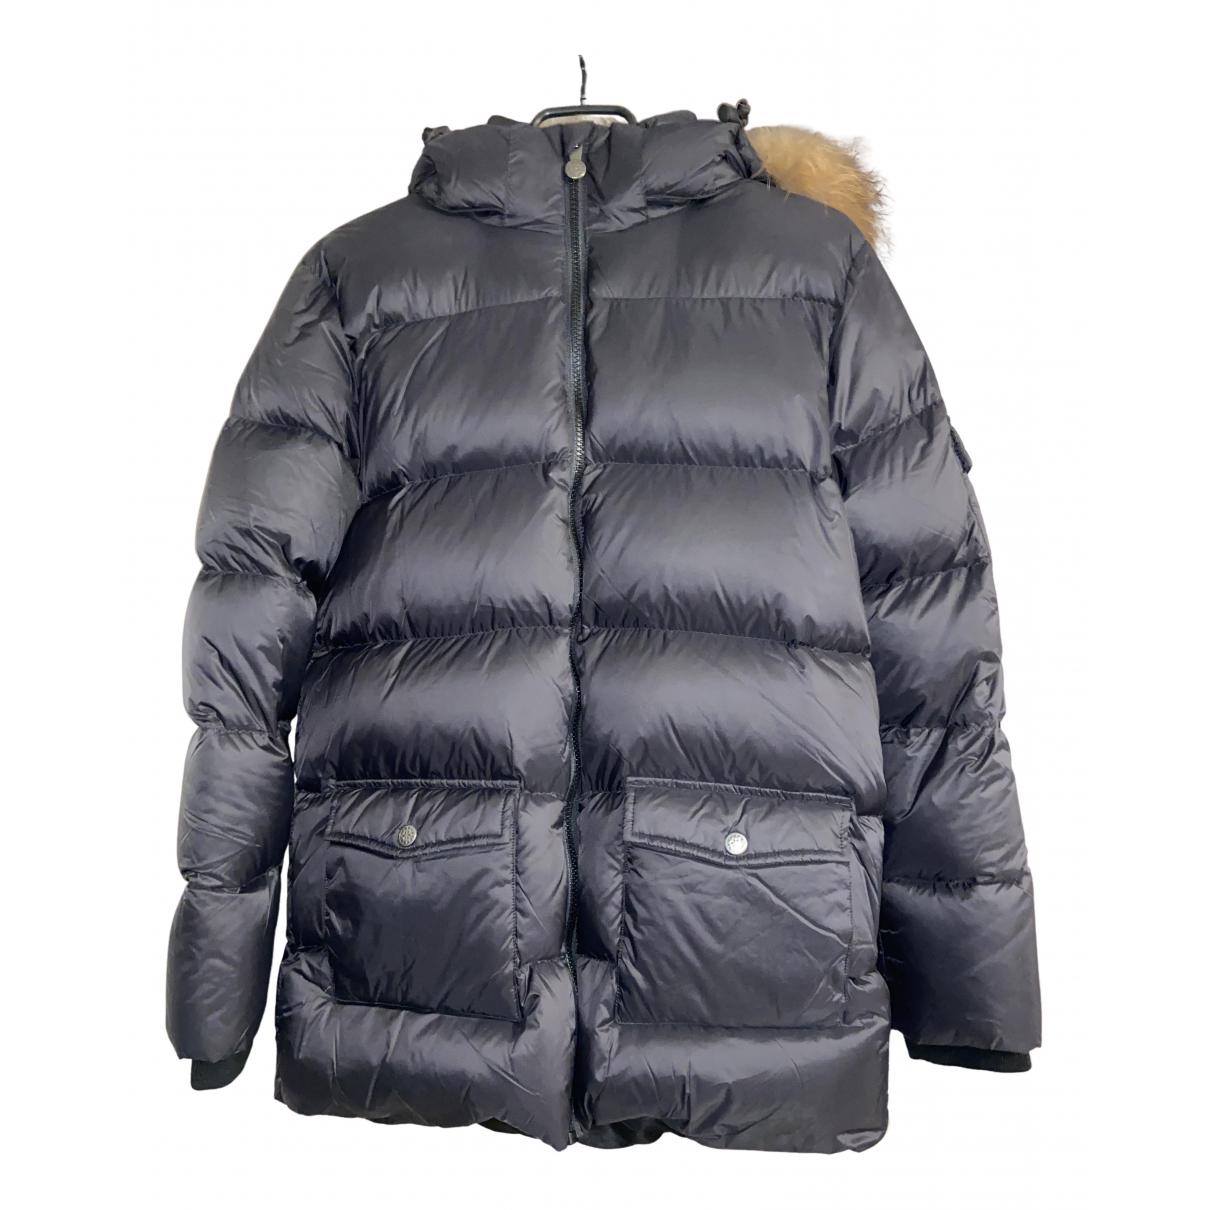 Pyrenex N Black Beaver jacket & coat for Kids 16 years - M FR